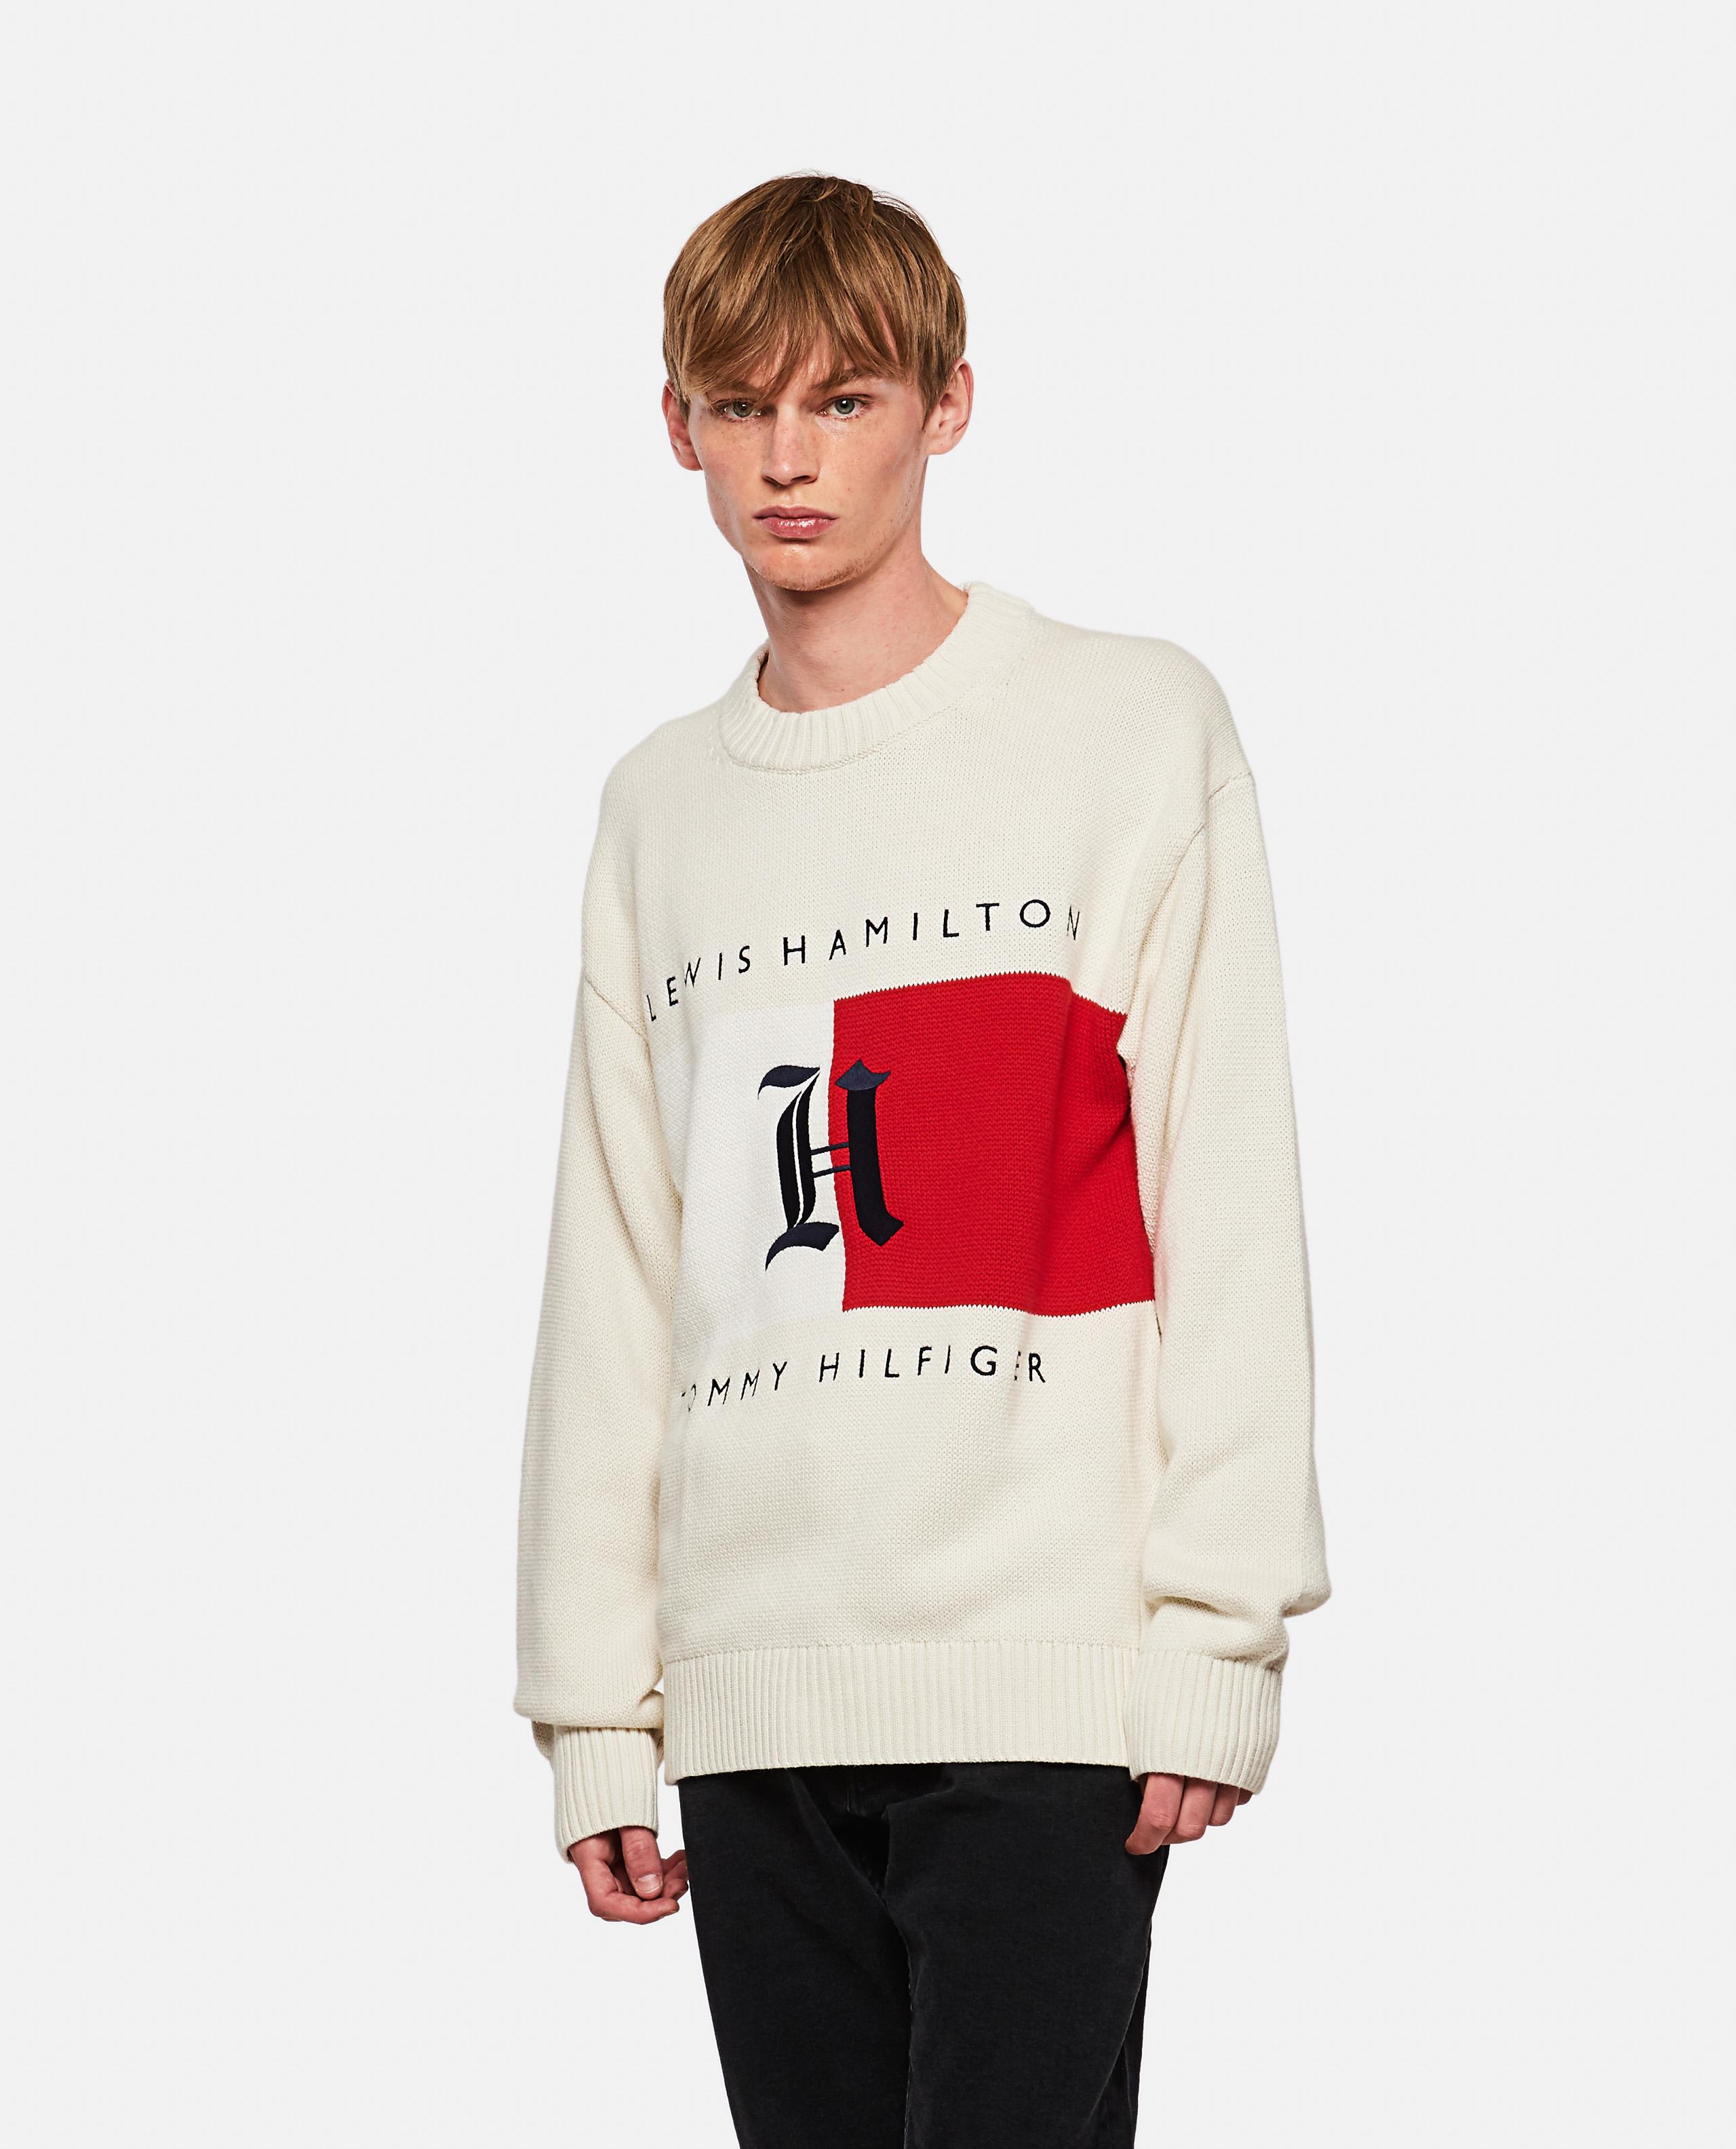 Lewis Hamilton X Tommy Hilfiger sweater